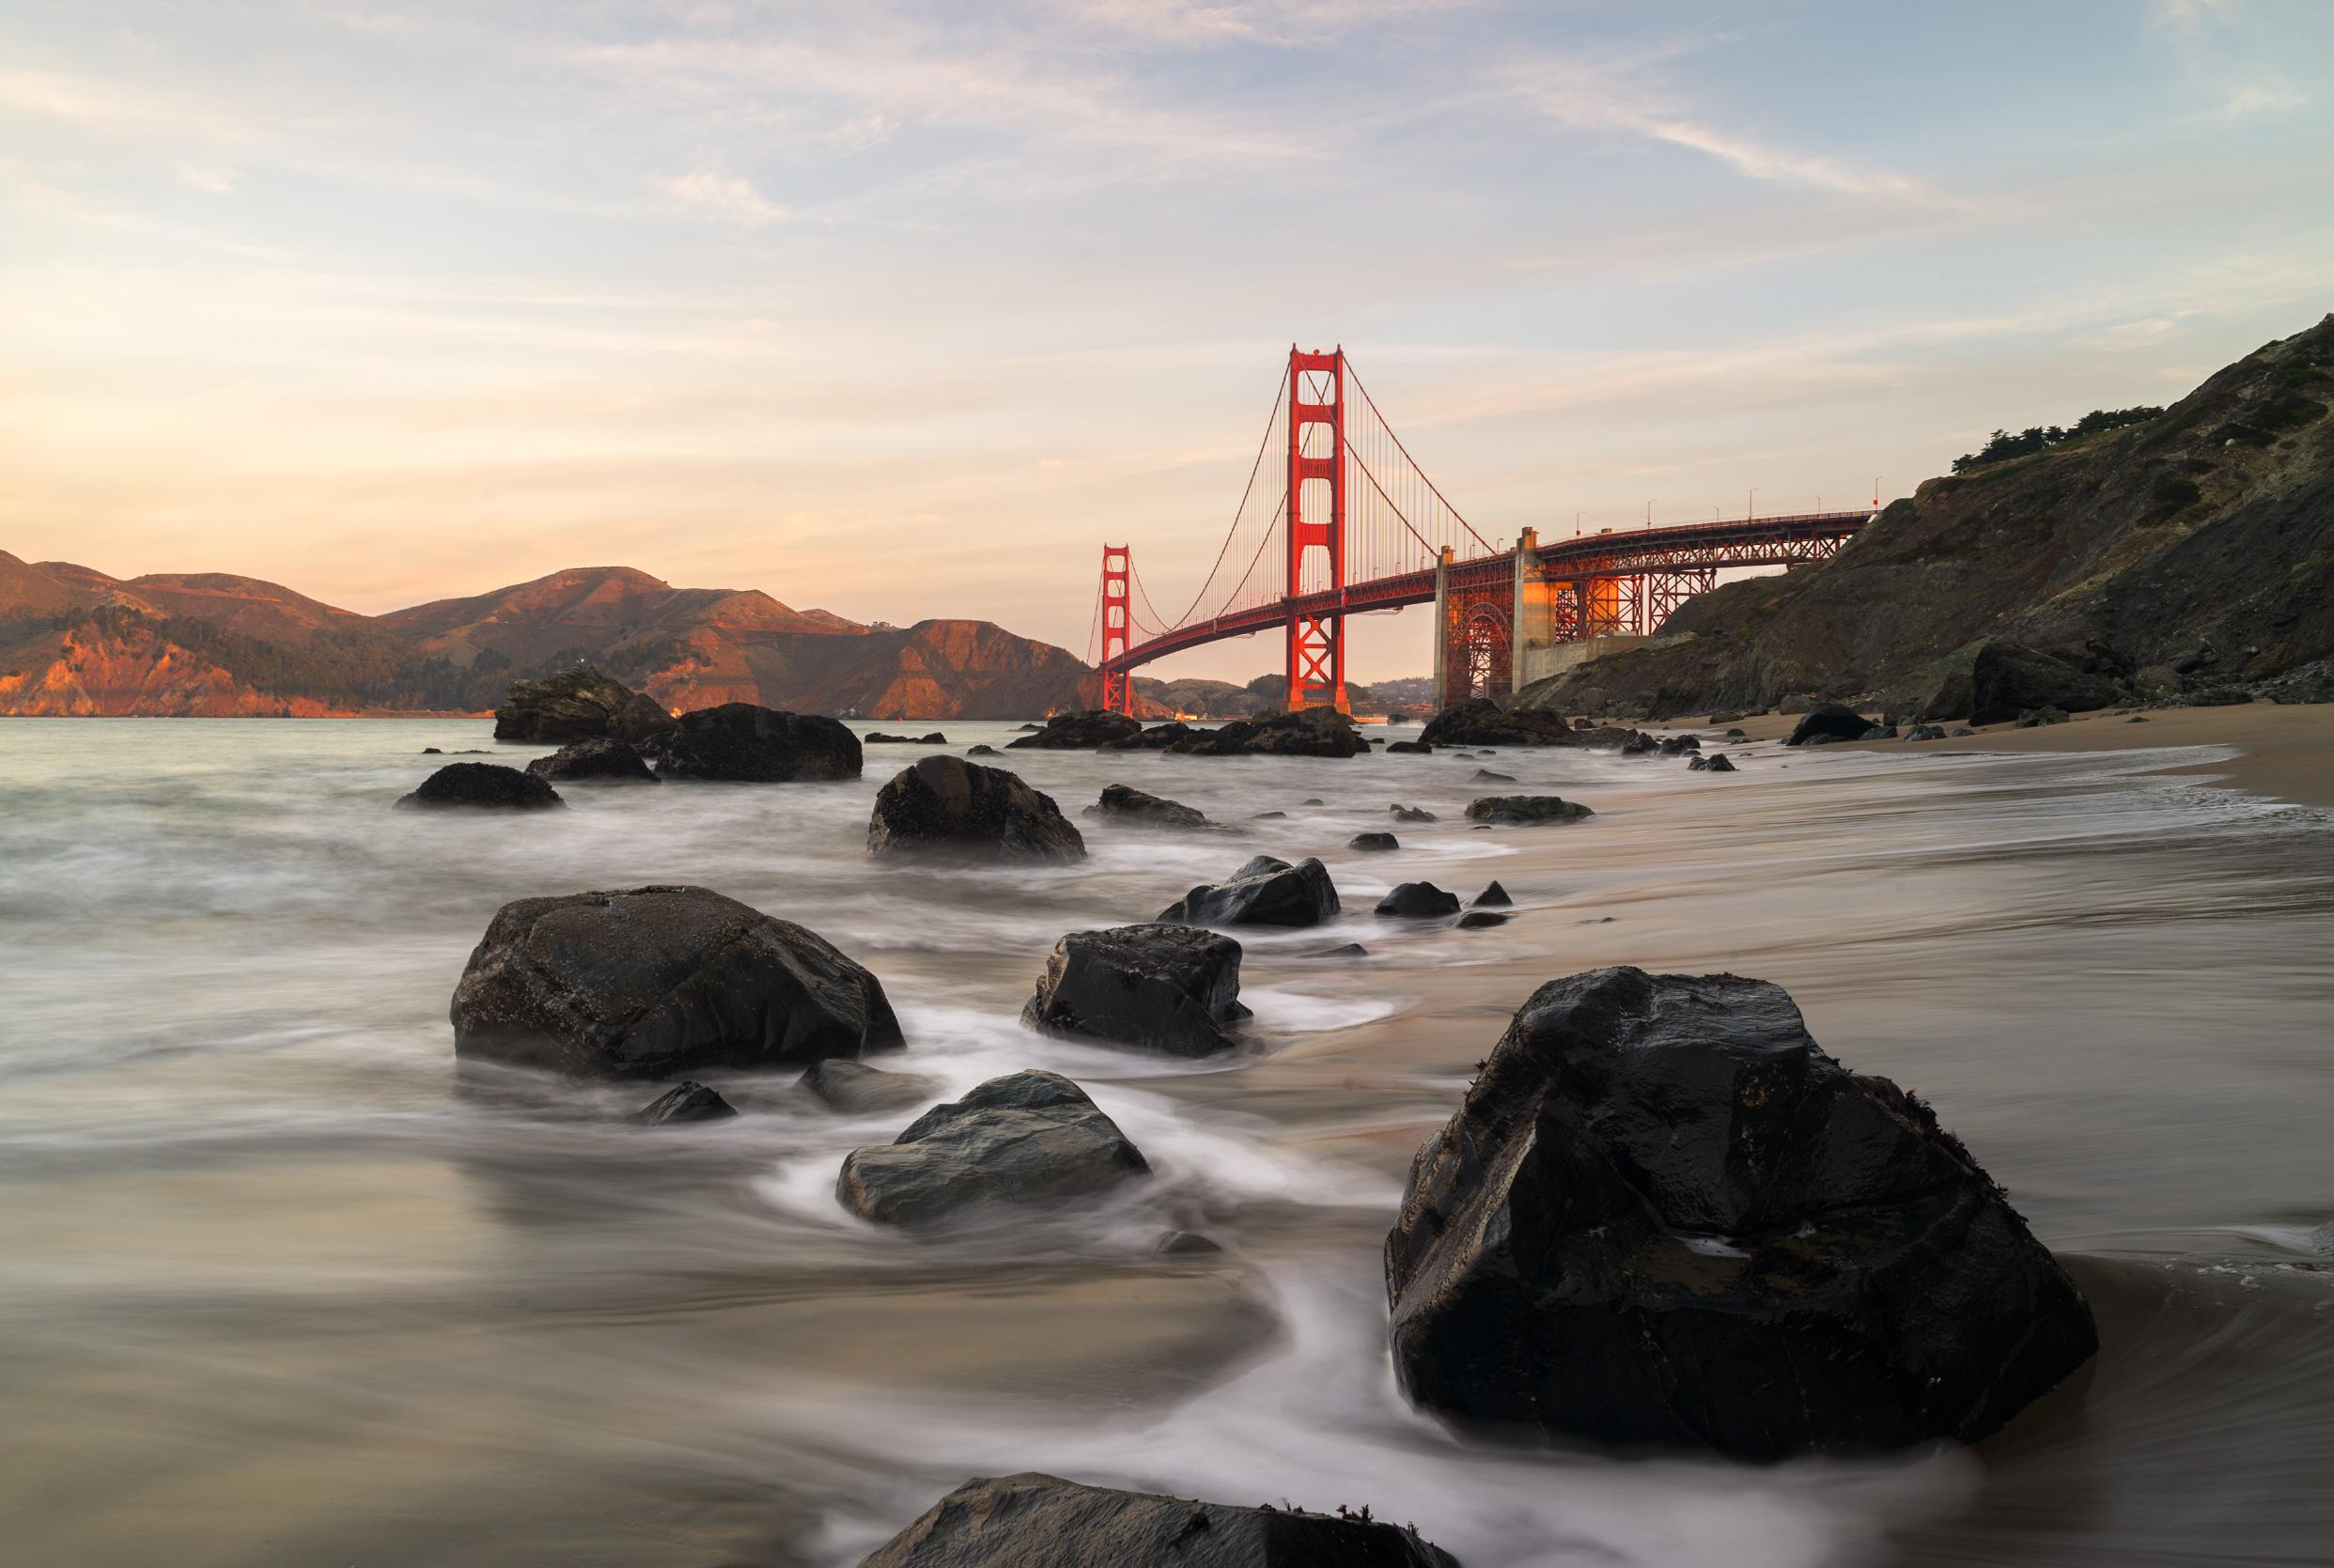 Marshall Beach, overlooking the Golden Gate Bridge.